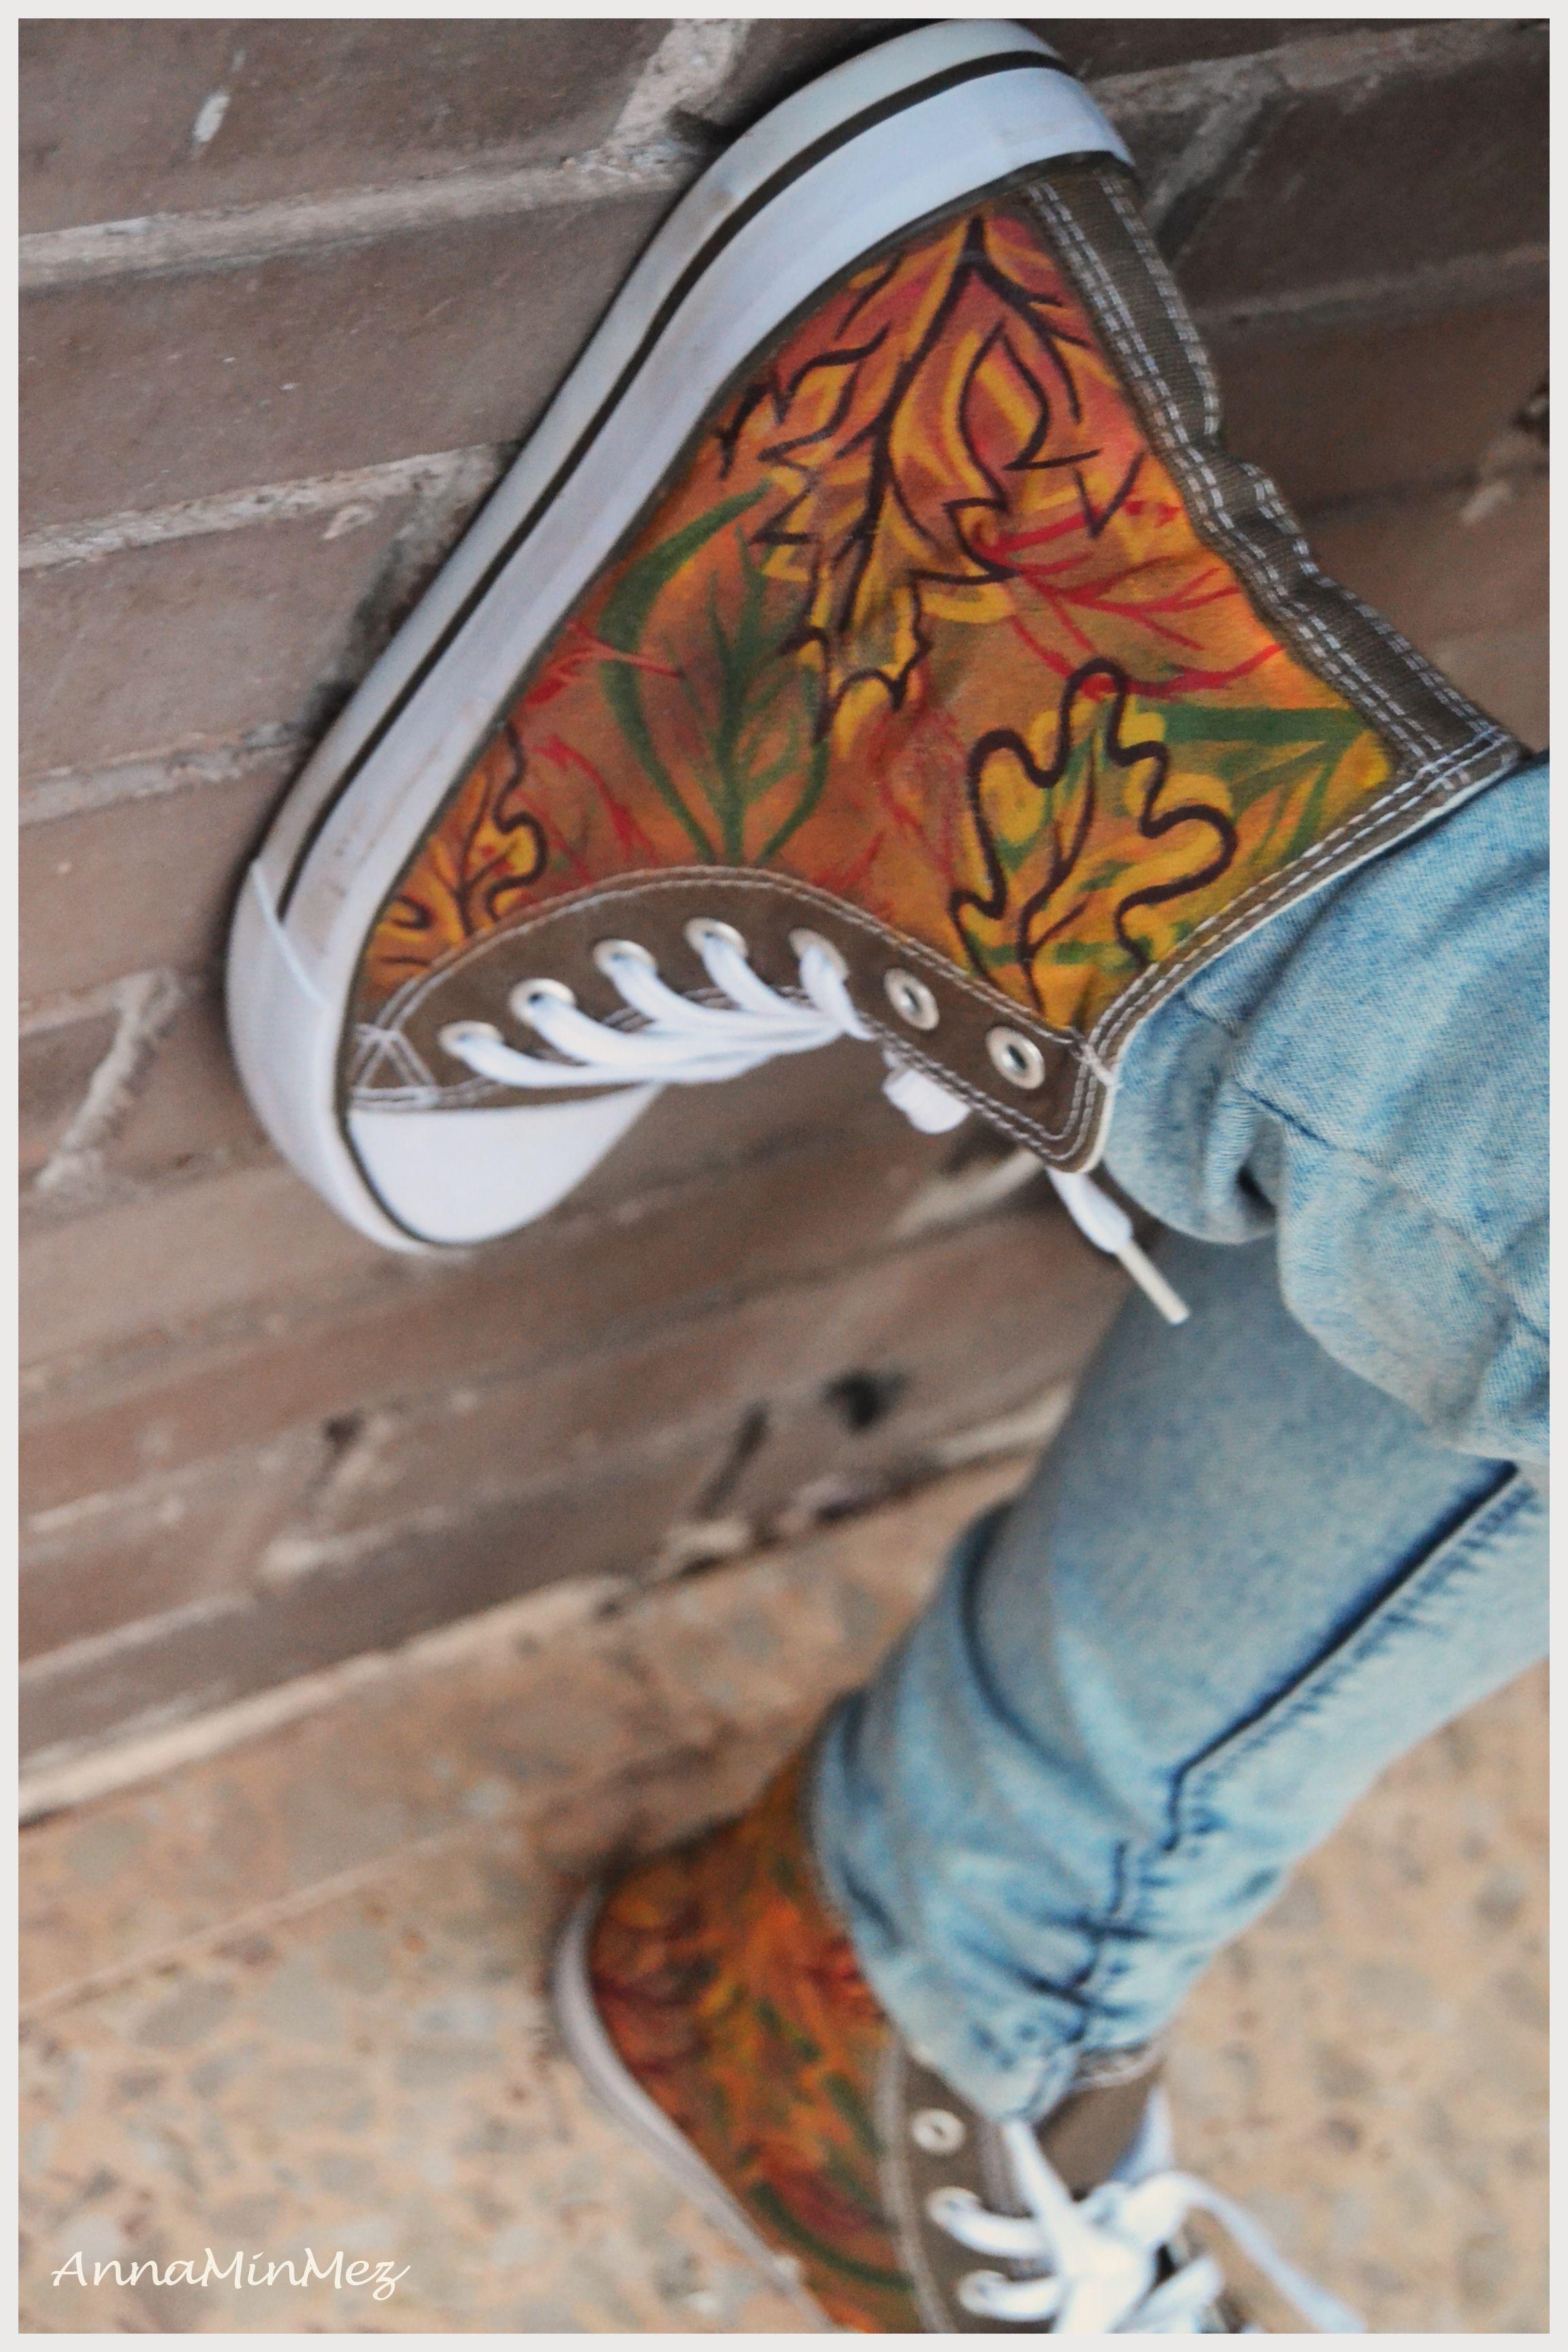 #Leaves #Autumn #hand_made #Converse #AnnaMinMez #Design #Illustration